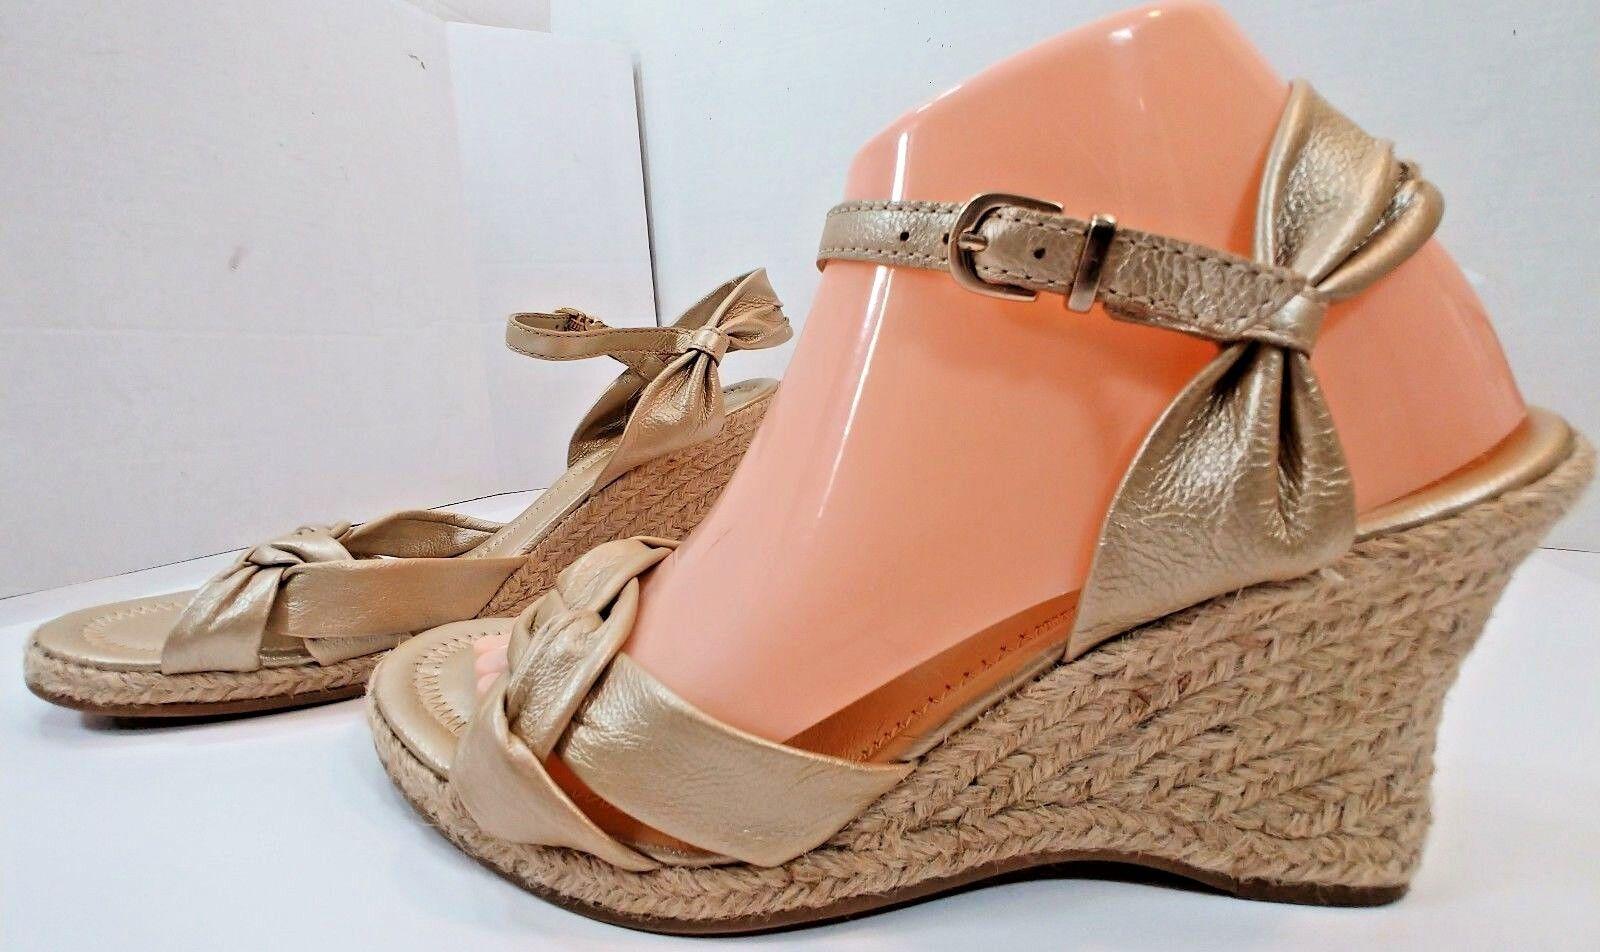 New Antonio Melani Beige gold Leather Espadrille Wedge Sandals shoes Womens 8.5M